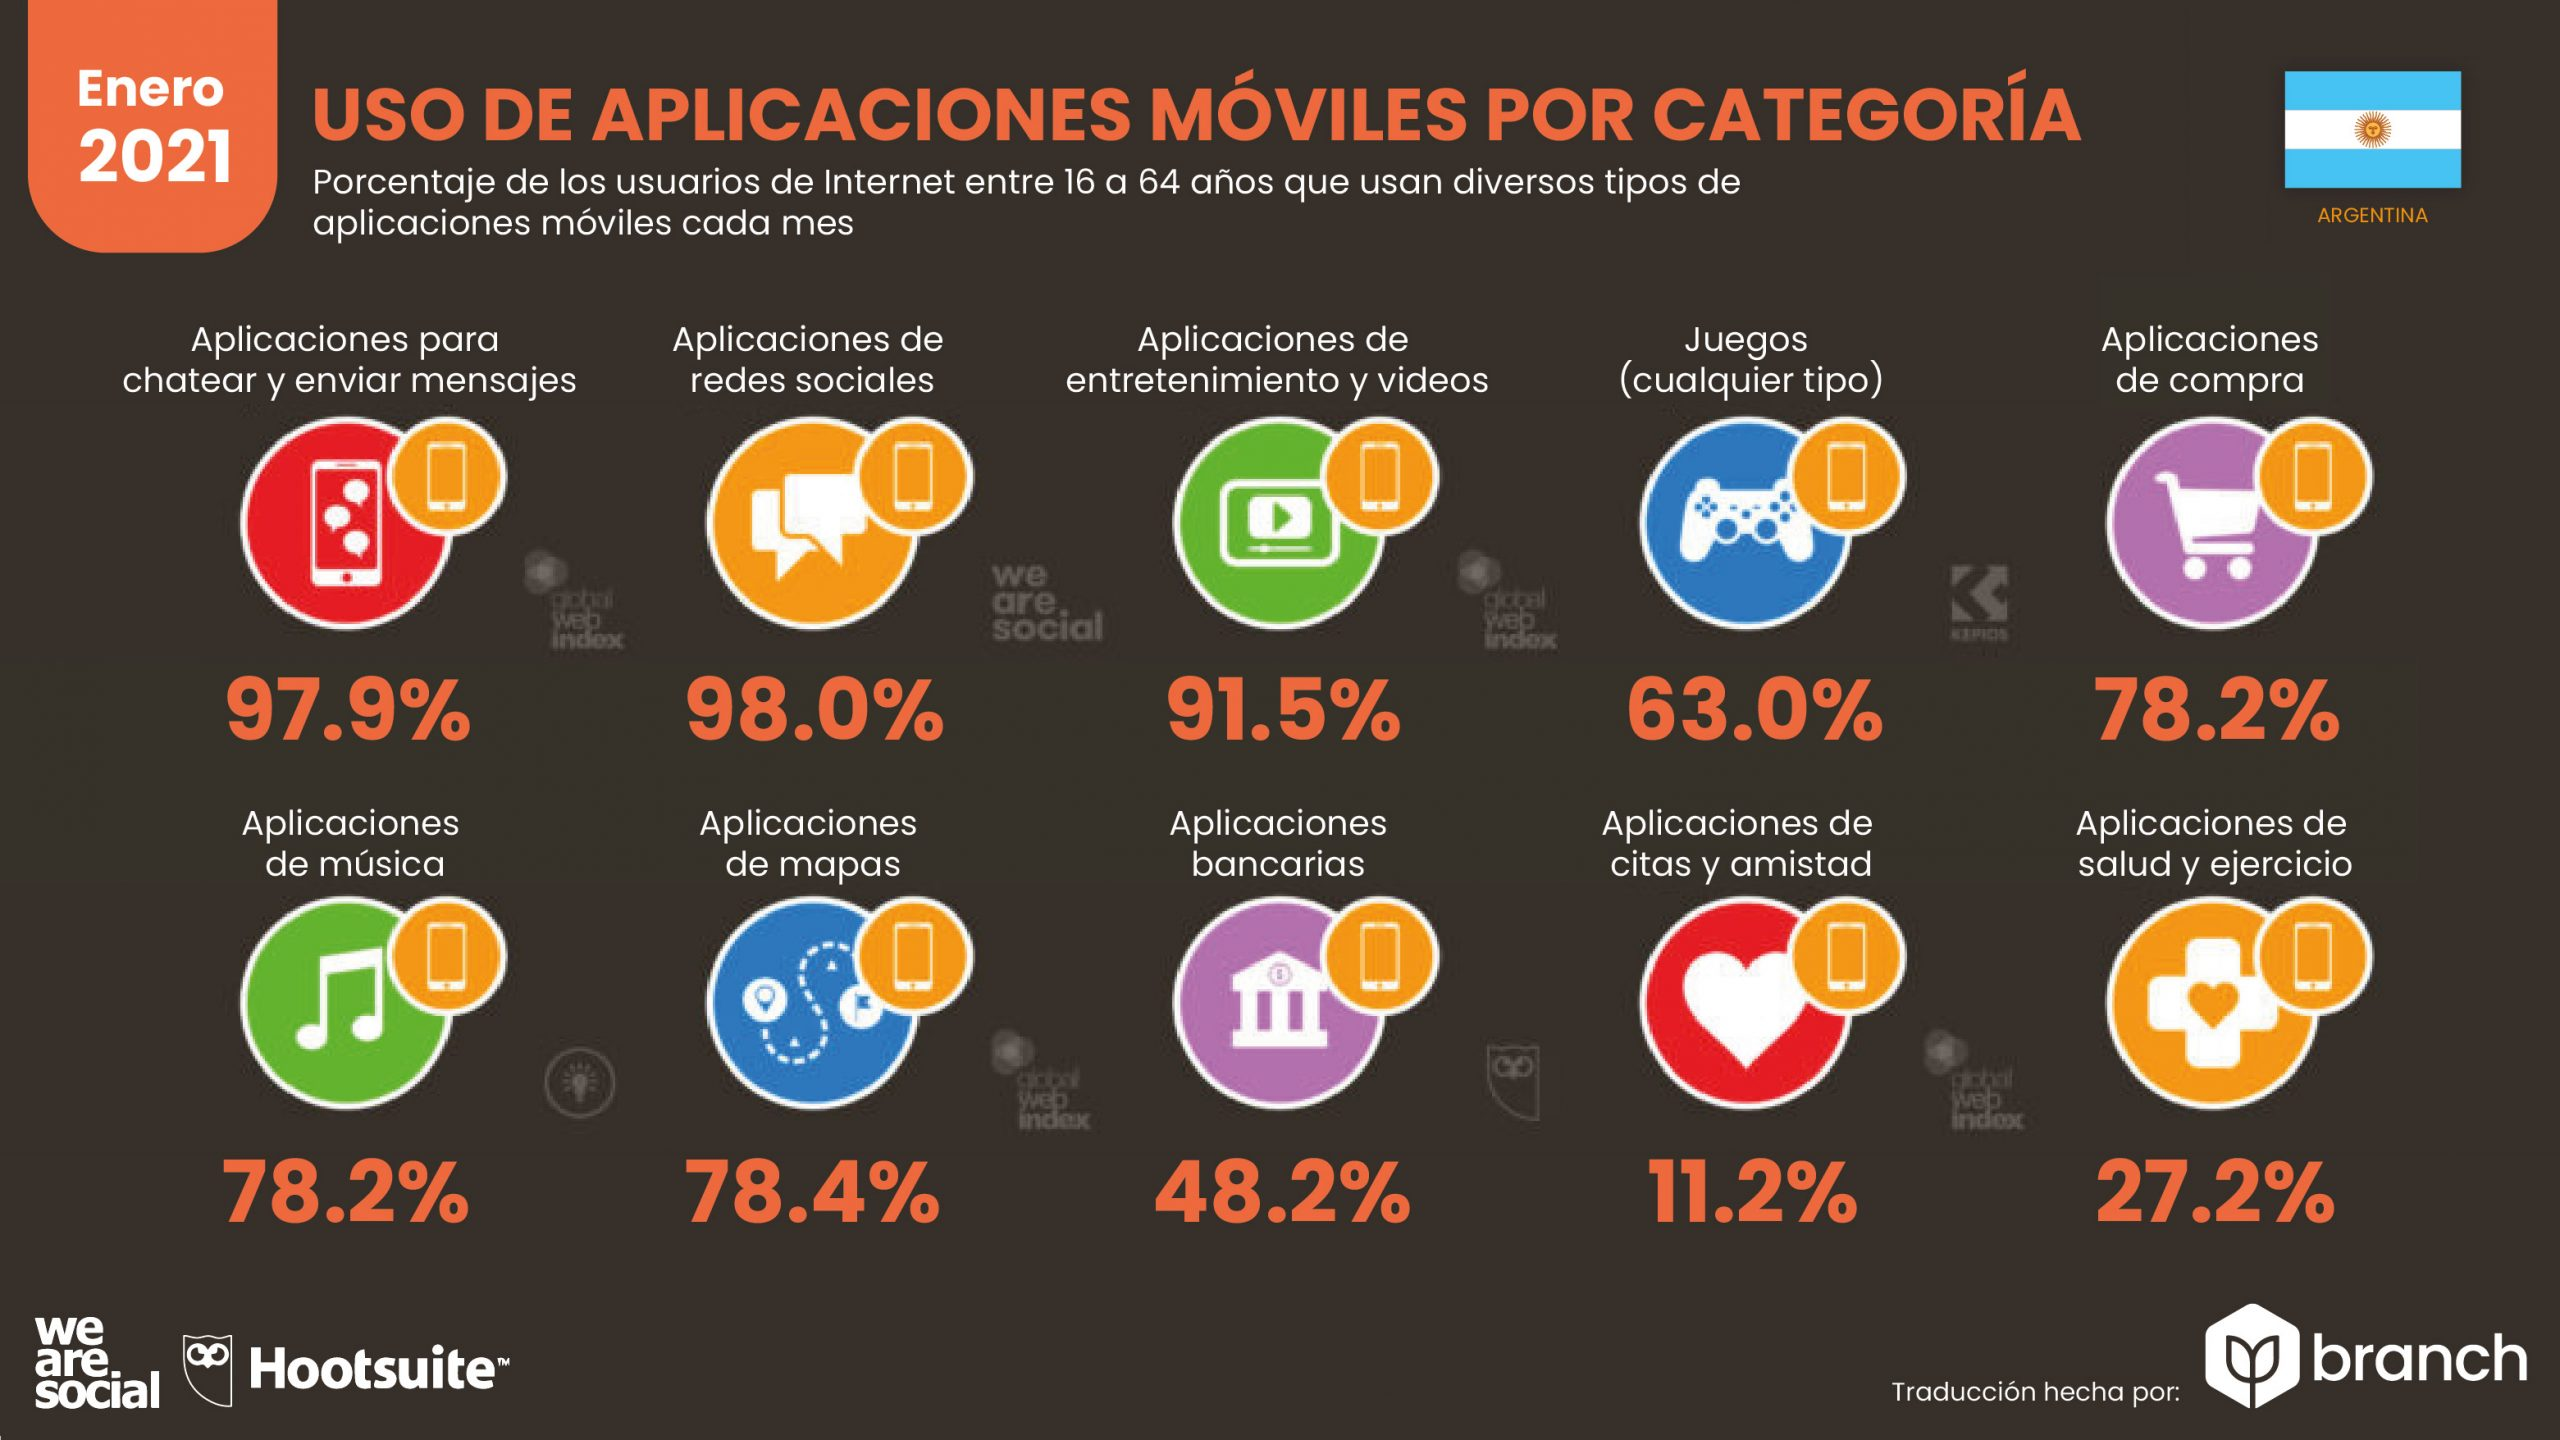 grafico-uso-de-aplicaciones-organizadas-por-categoria-argentina-2020-2021